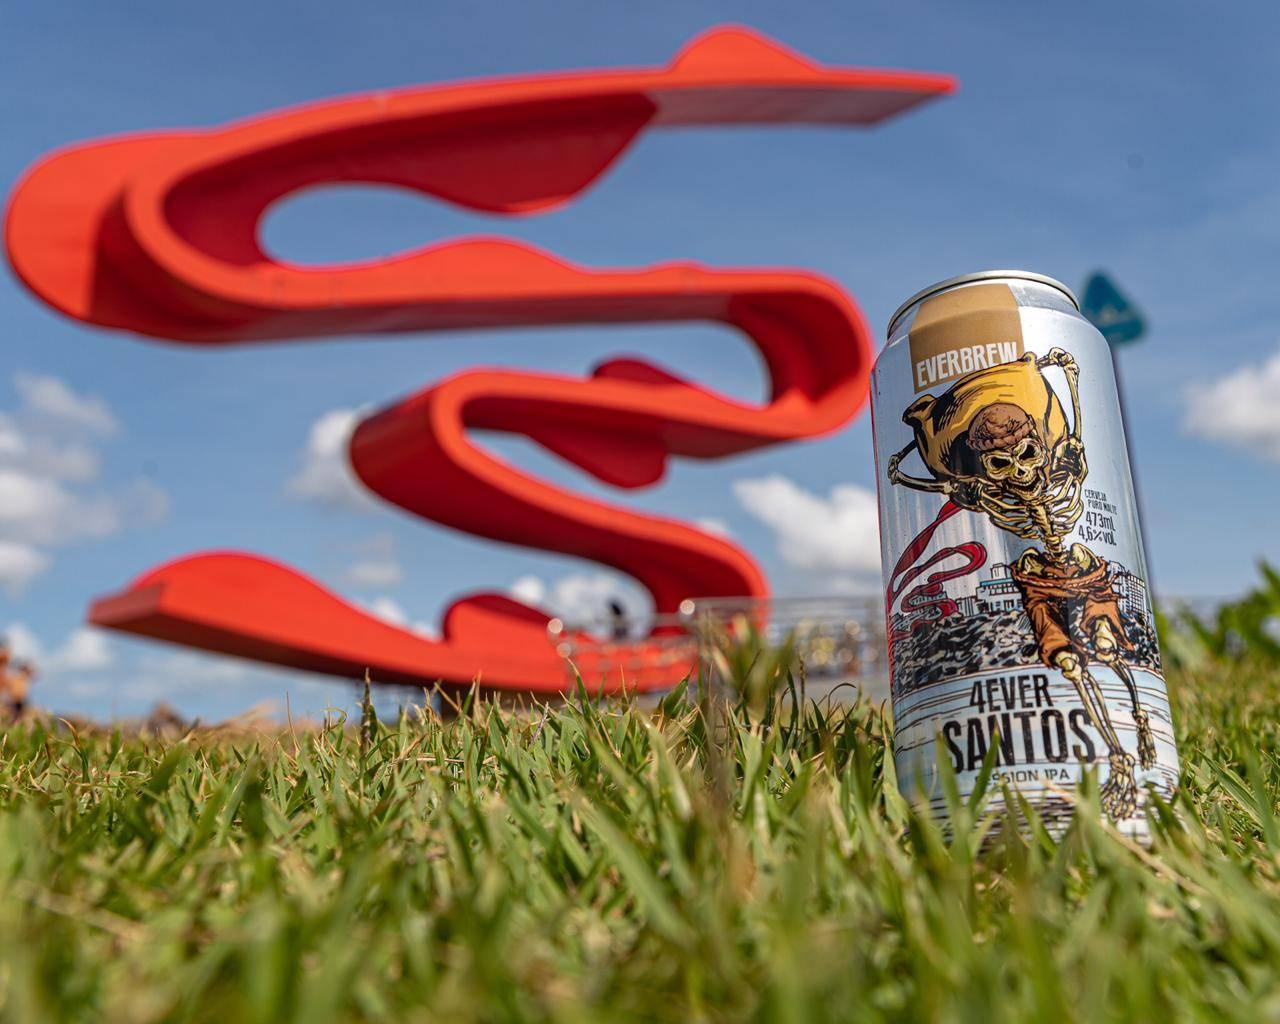 www.juicysantos.com.br - everbrew cerveja de santos